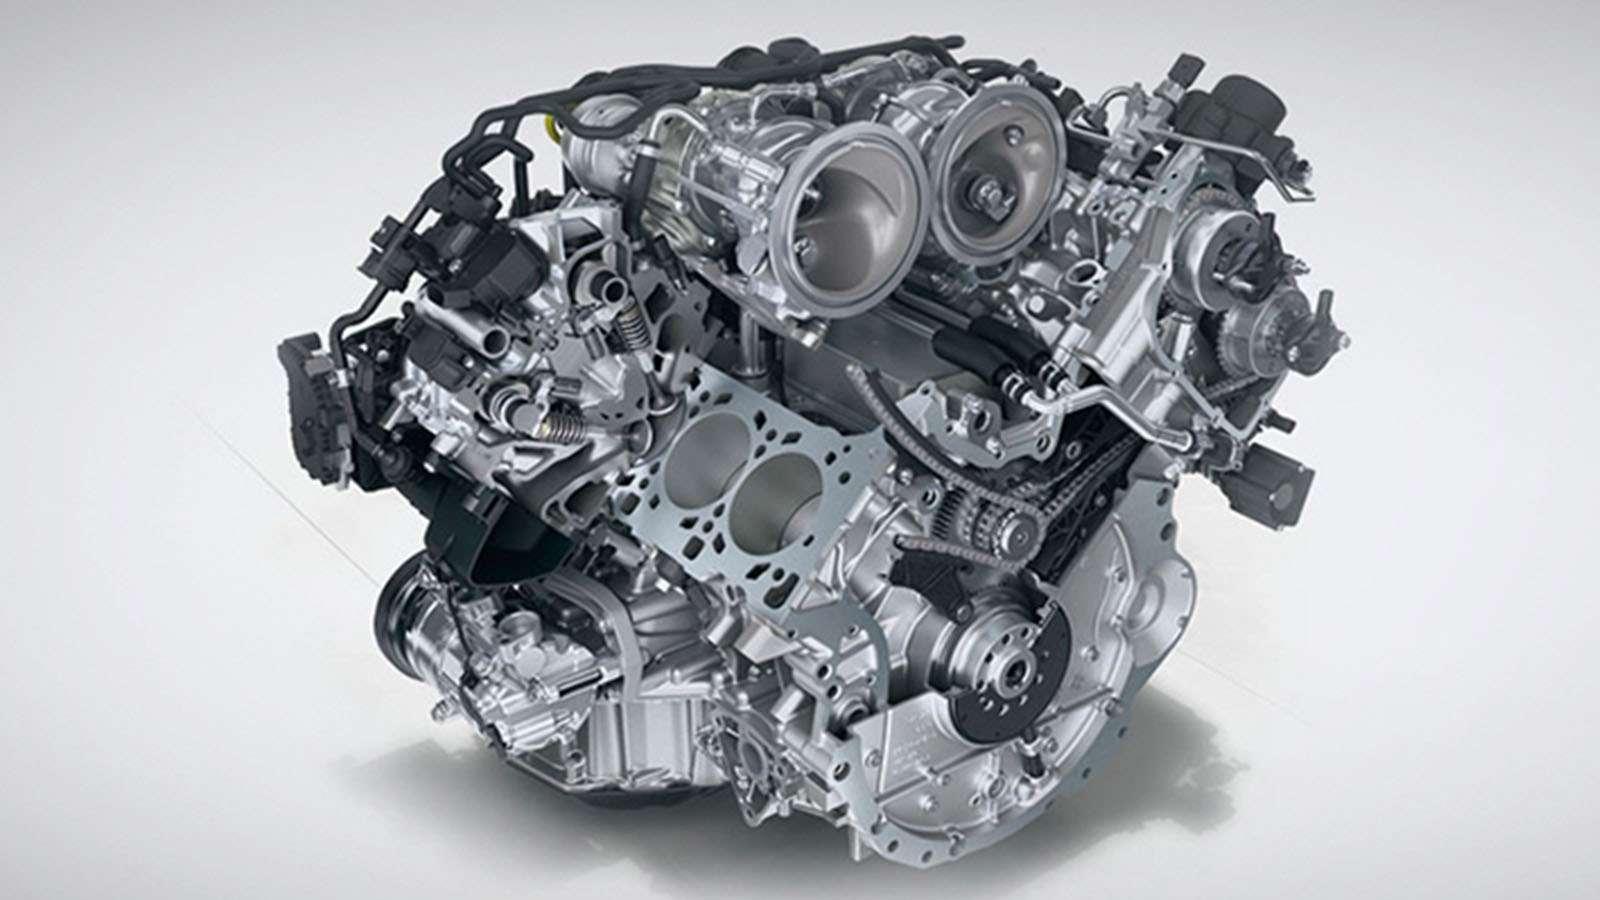 Porsche Panamera Engines